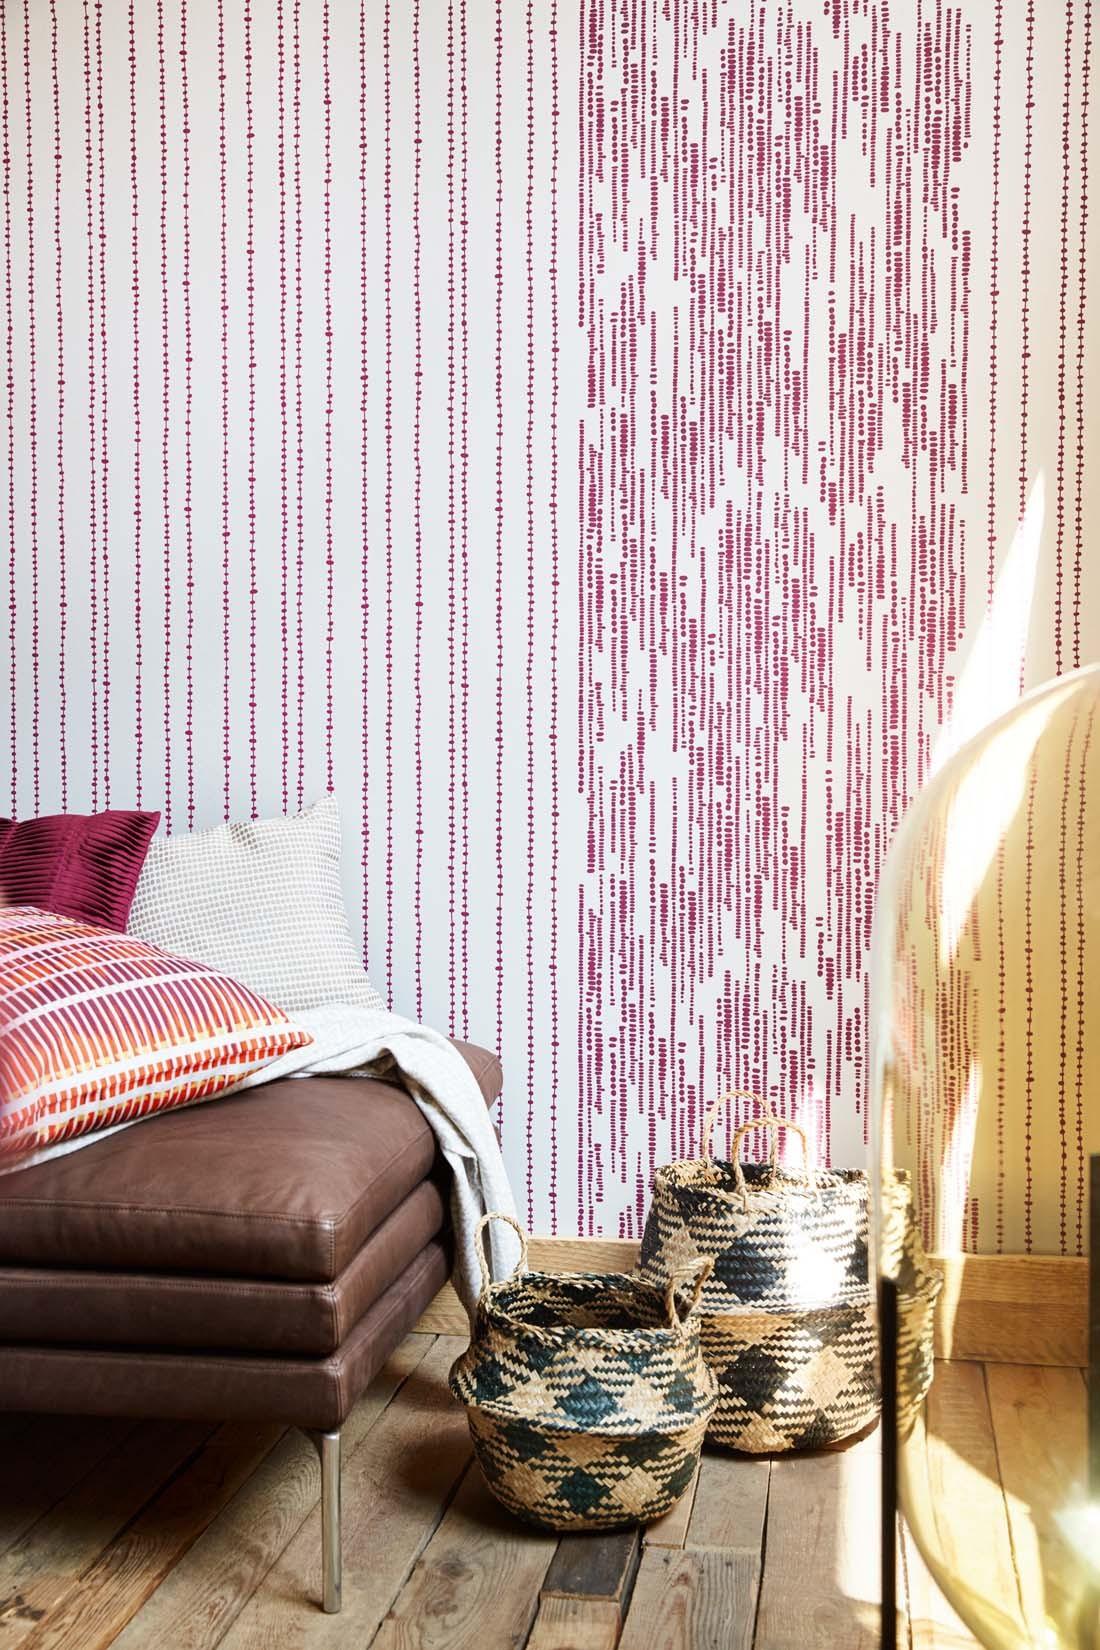 esprit home collection 11 esprit tapeten gratis versand. Black Bedroom Furniture Sets. Home Design Ideas